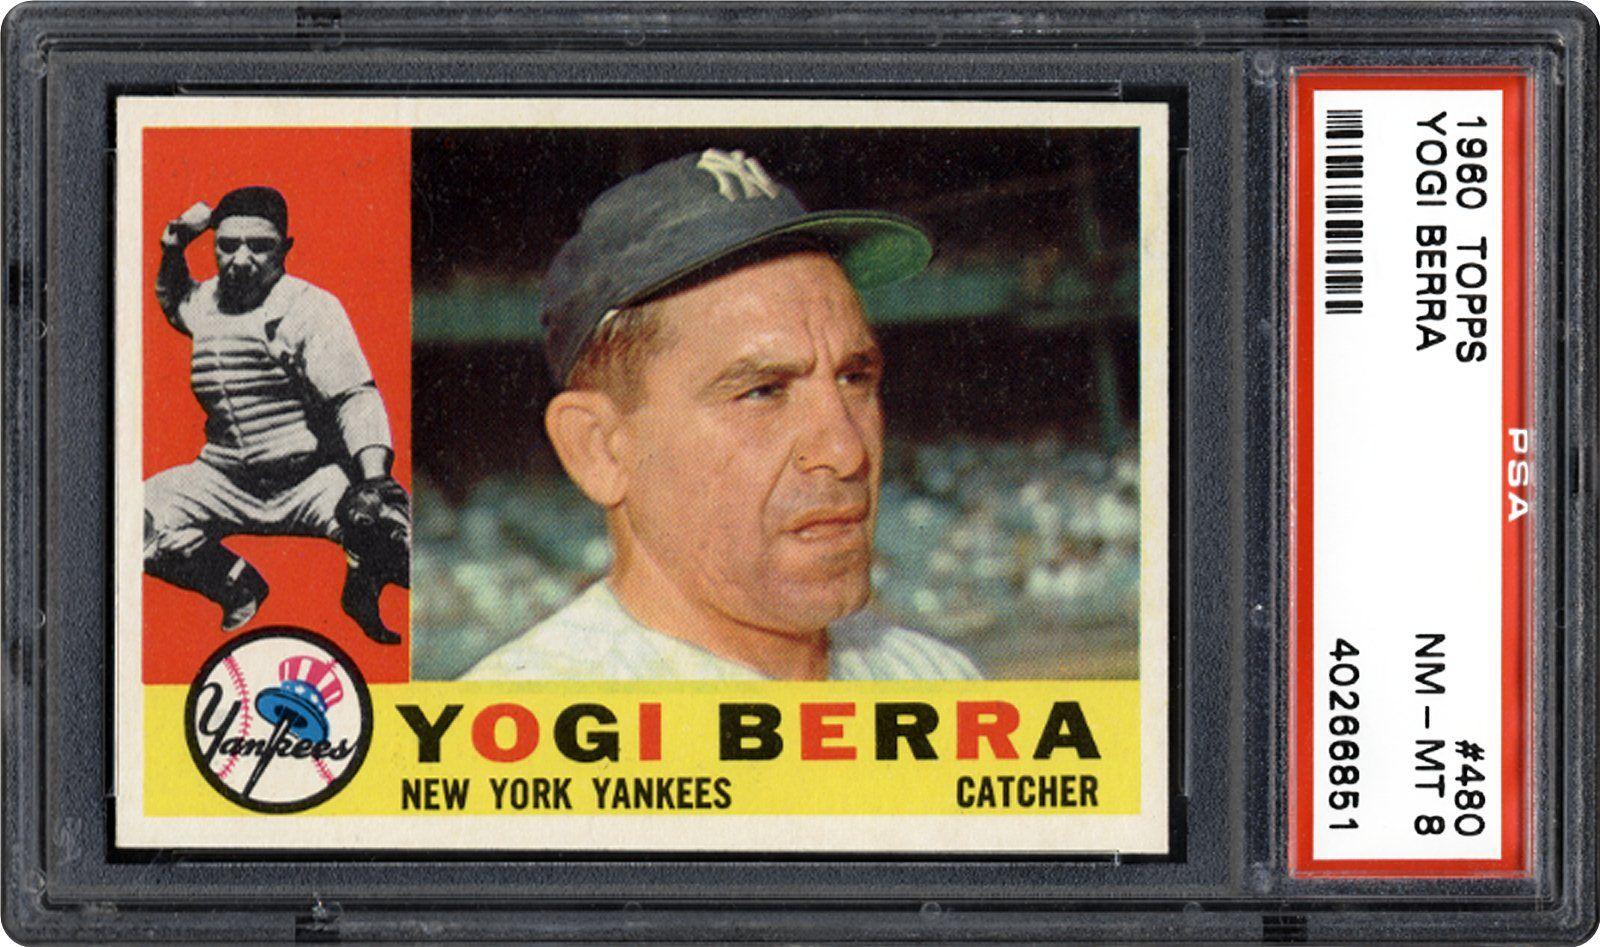 1960 Topps Yogi Berra Psa Cardfacts